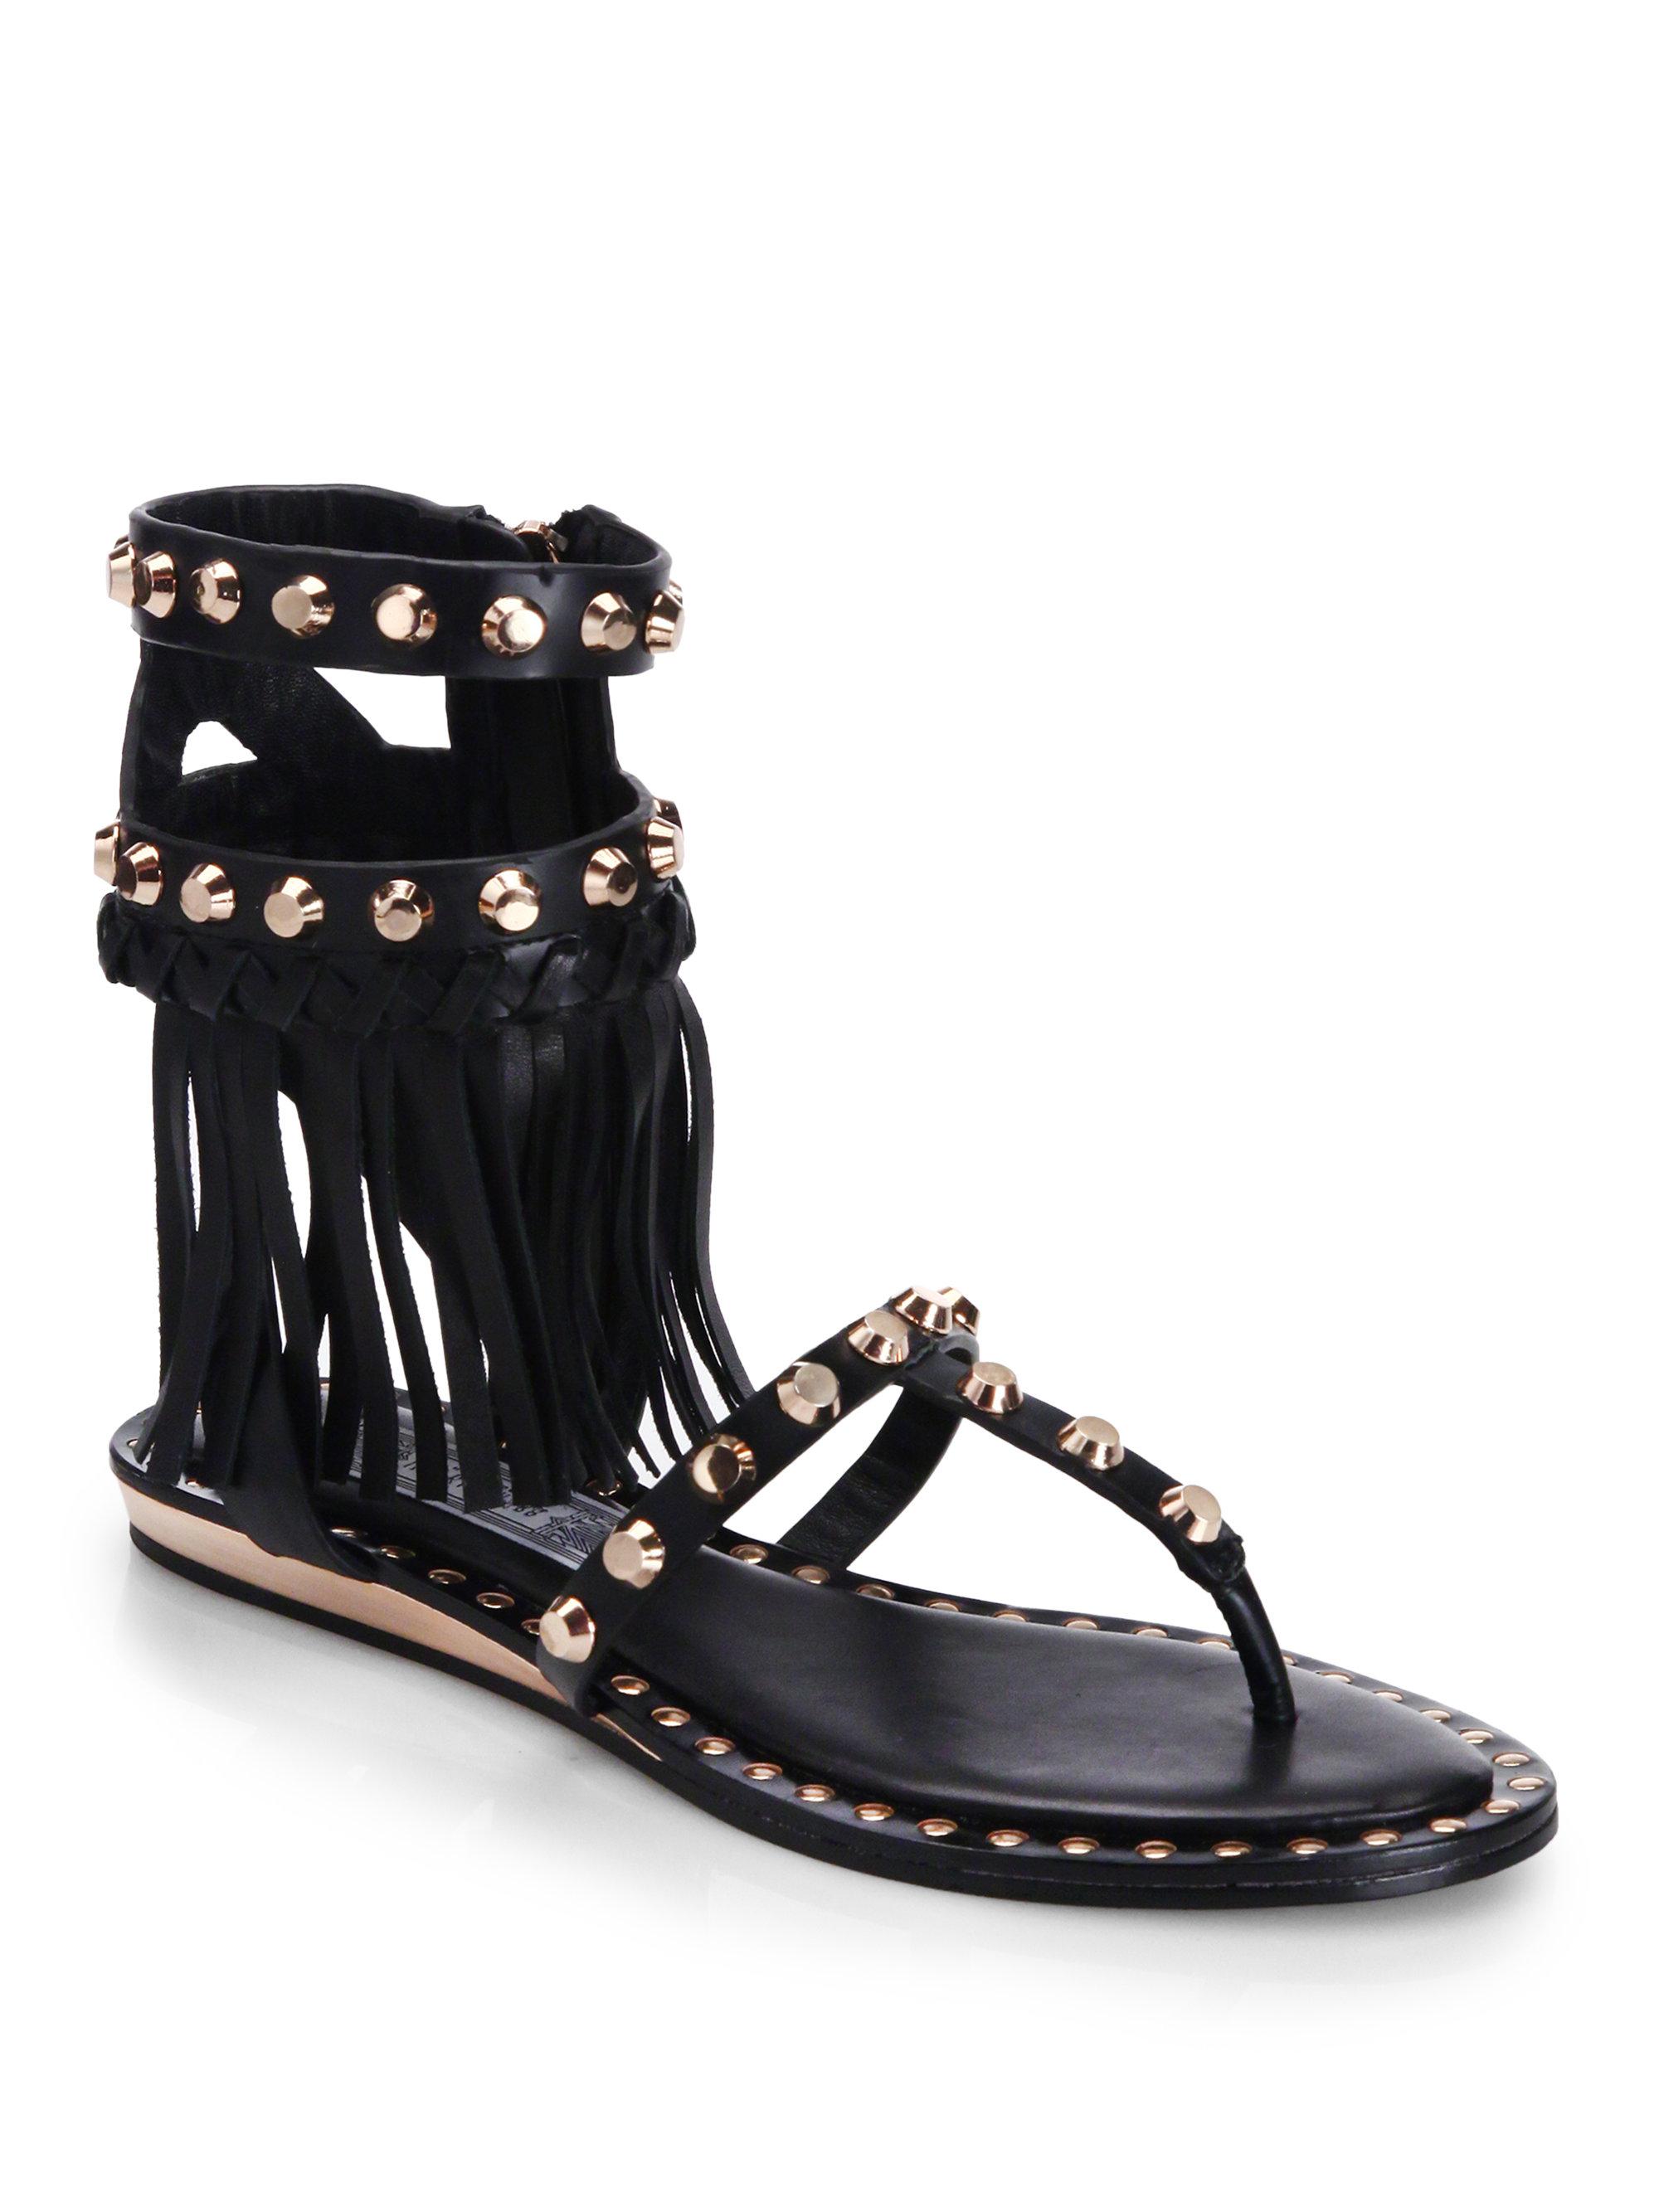 b26b6ce2bf80 Lyst - Ivy Kirzhner Barbados Studded Fringe Flat Leather Sandals in ...